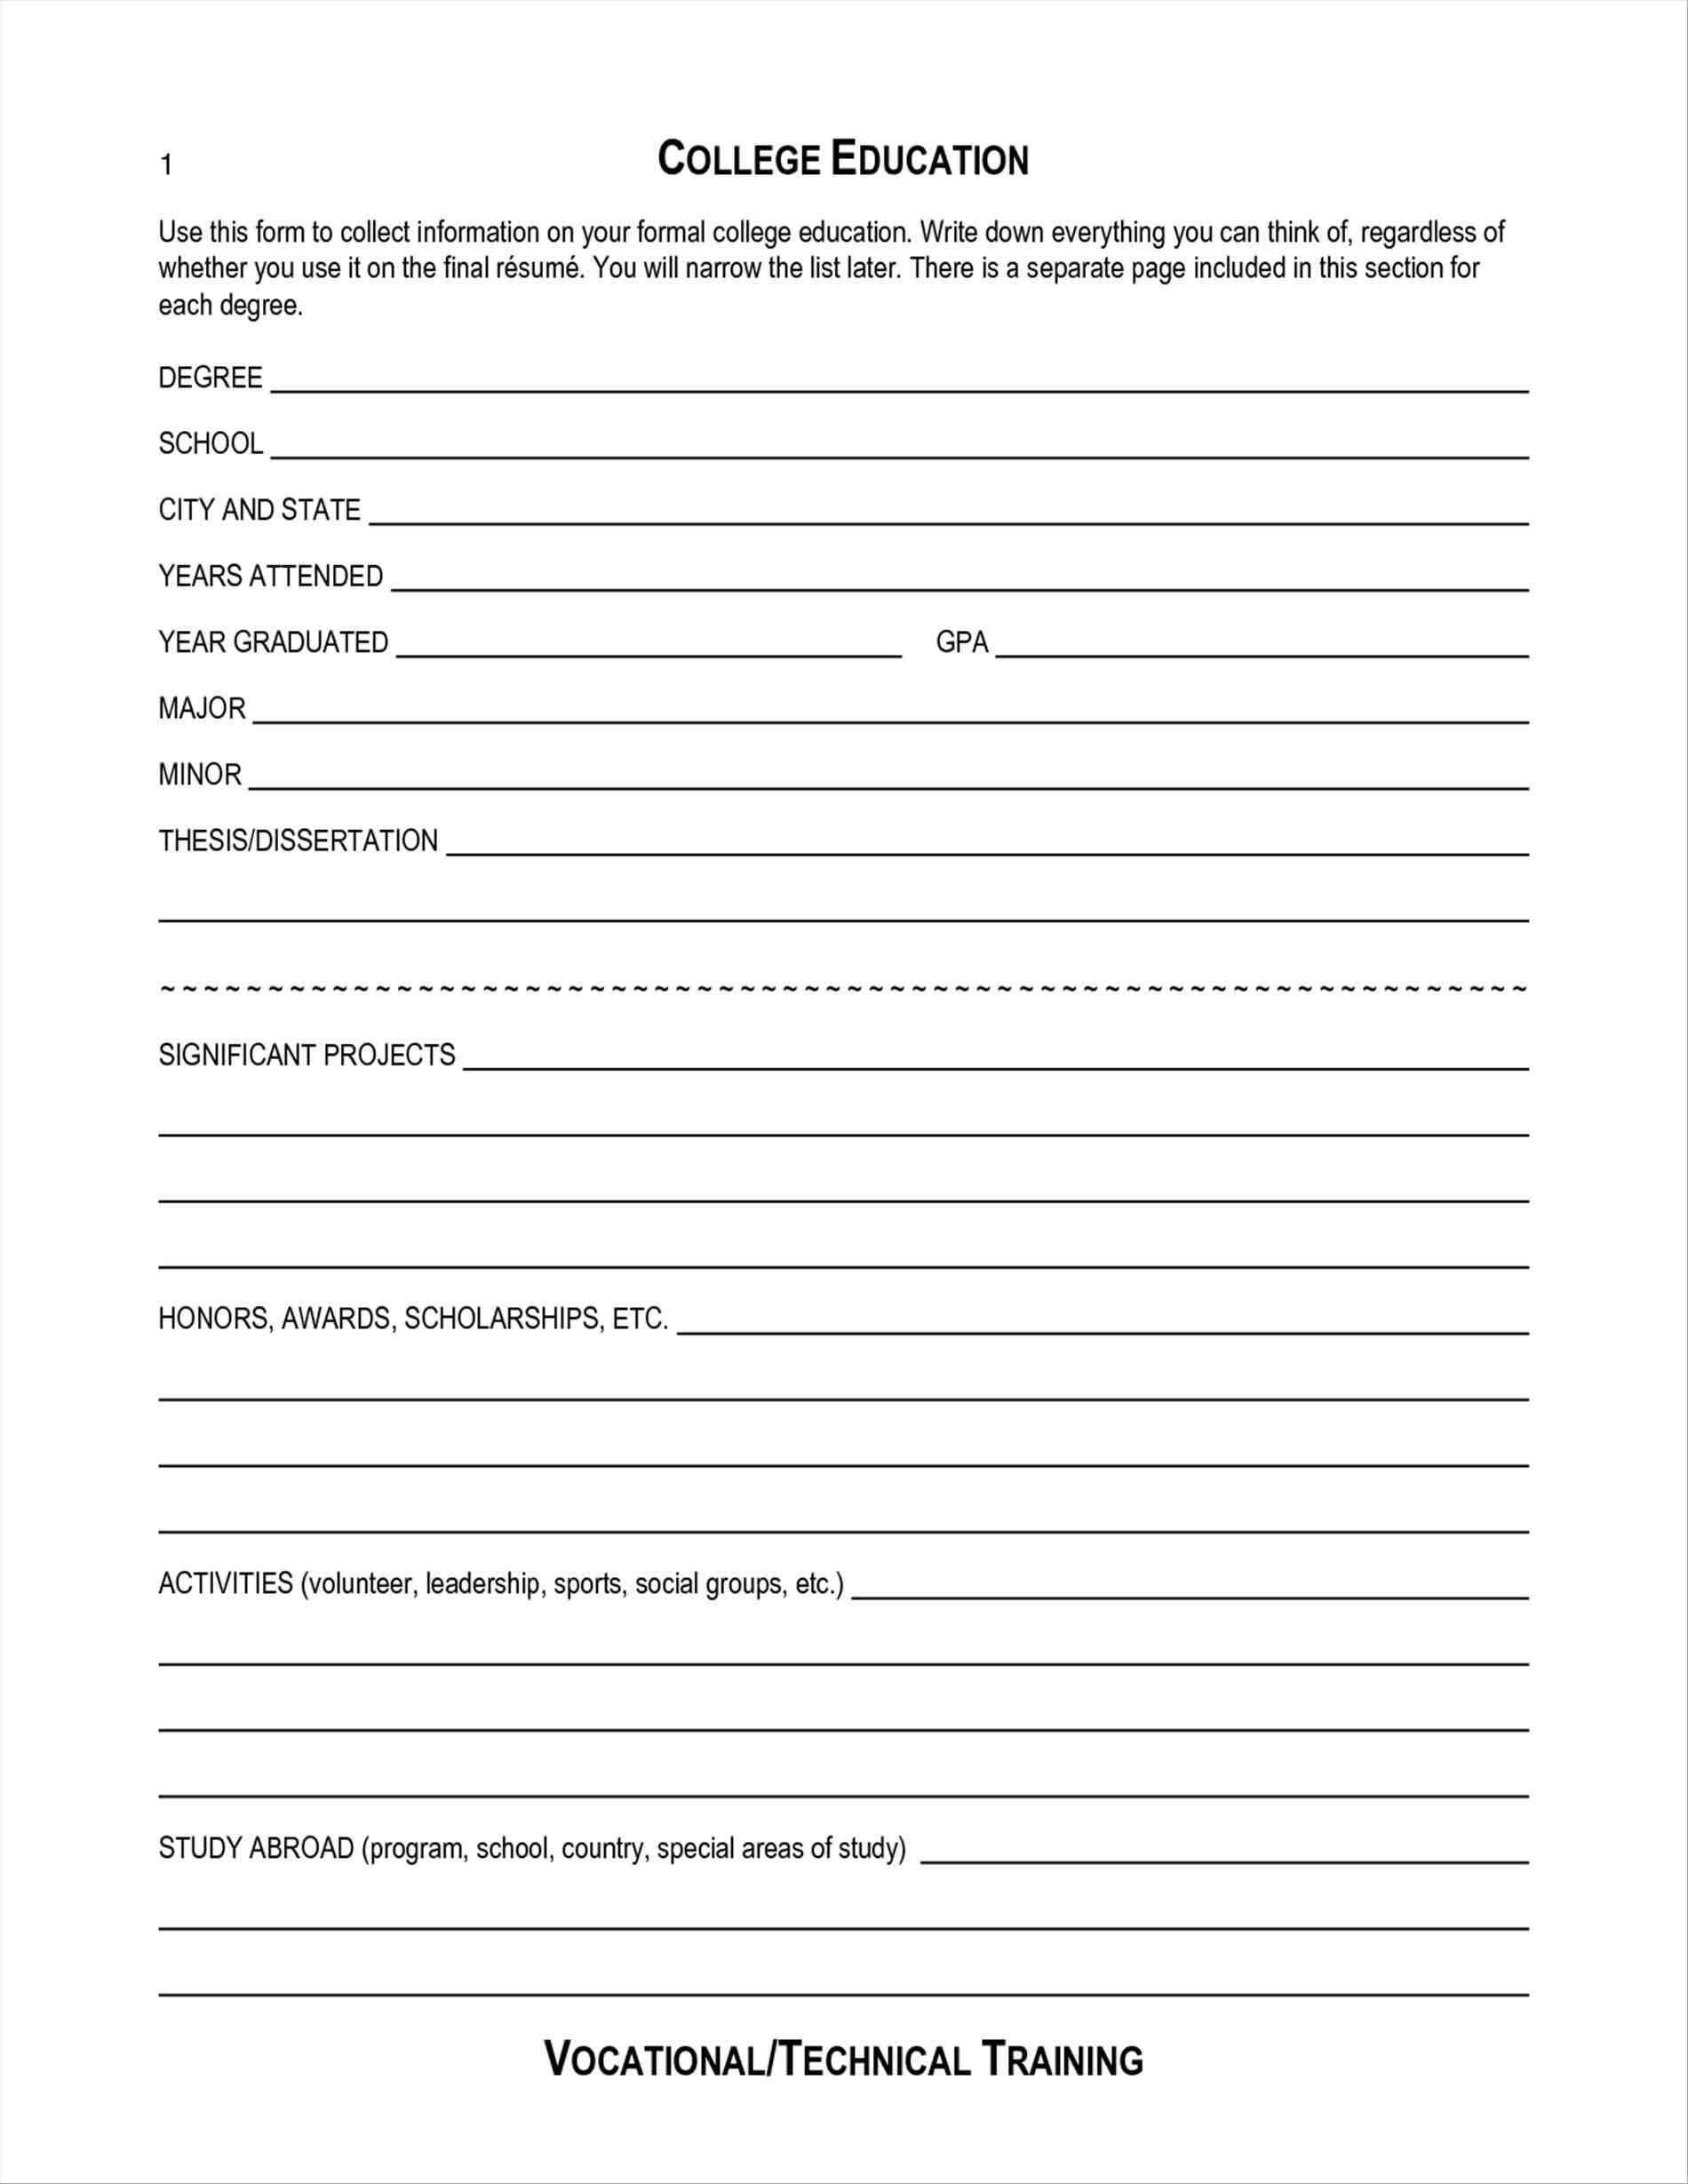 028 Free Blank Resume Templates Template Ideas Printable Pdf throughout Blank Resume Templates For Microsoft Word